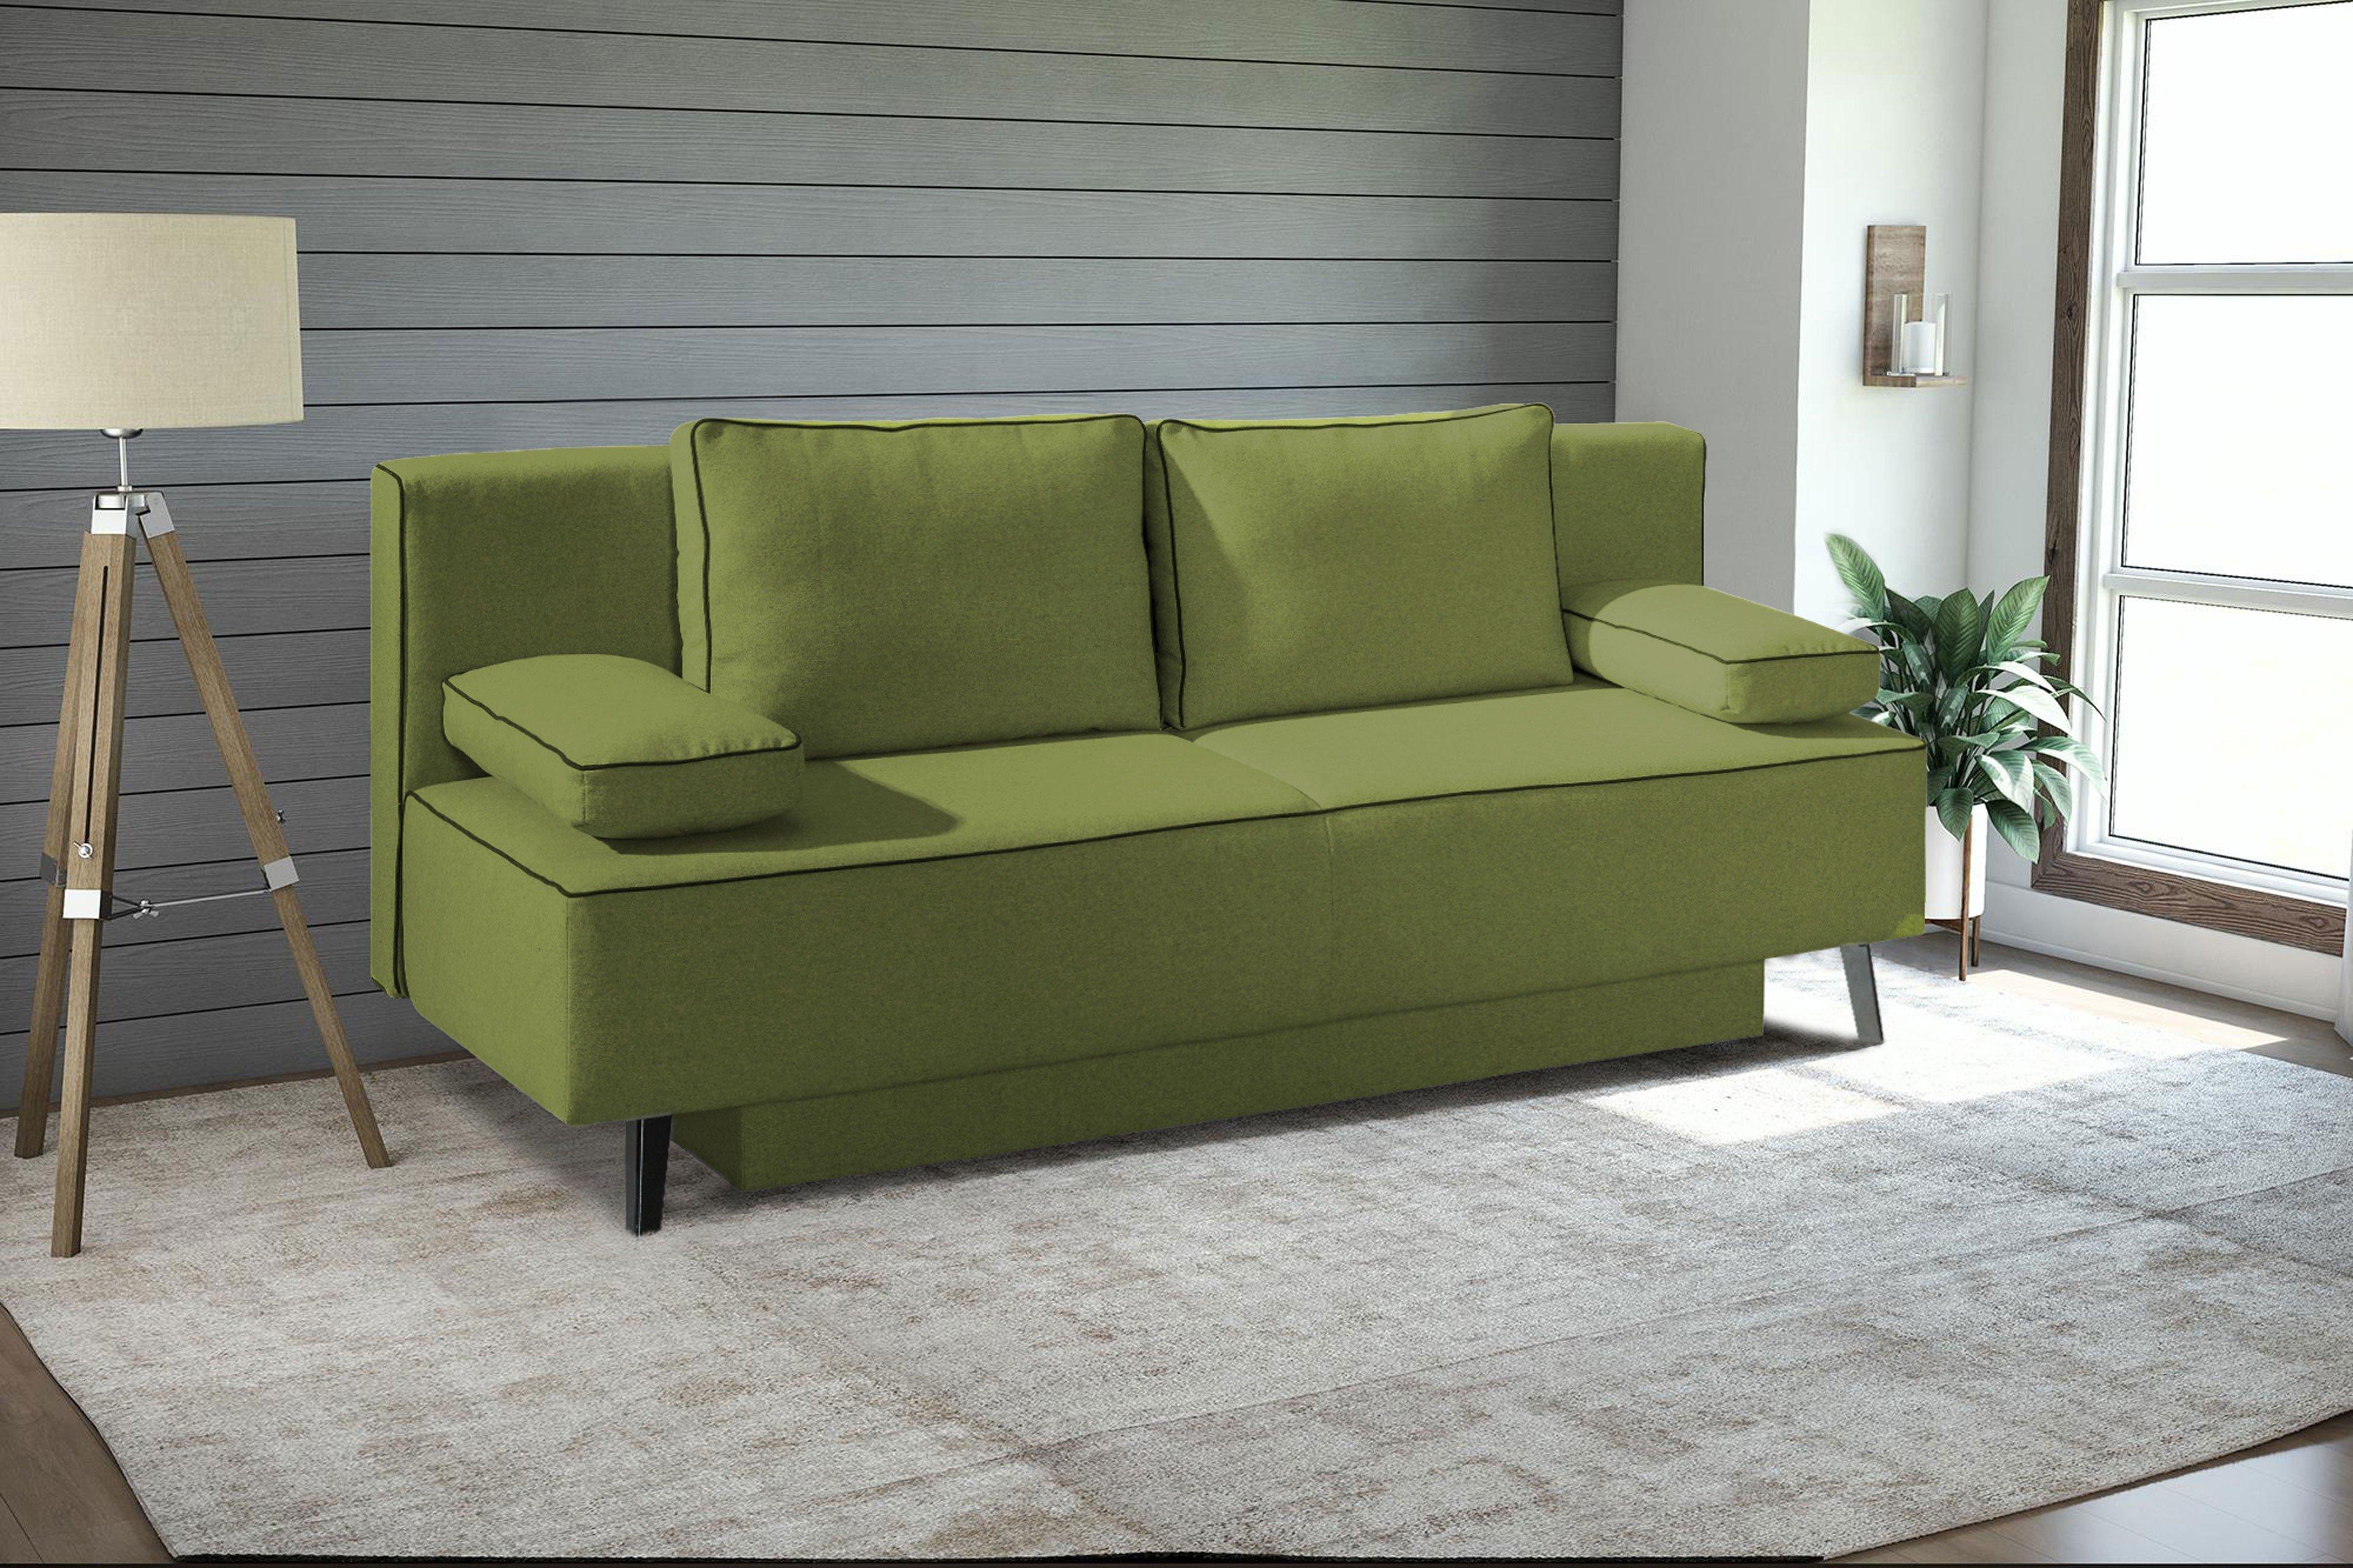 restyl schlafsofa chuck kansas in gr n mit keder schwarz. Black Bedroom Furniture Sets. Home Design Ideas